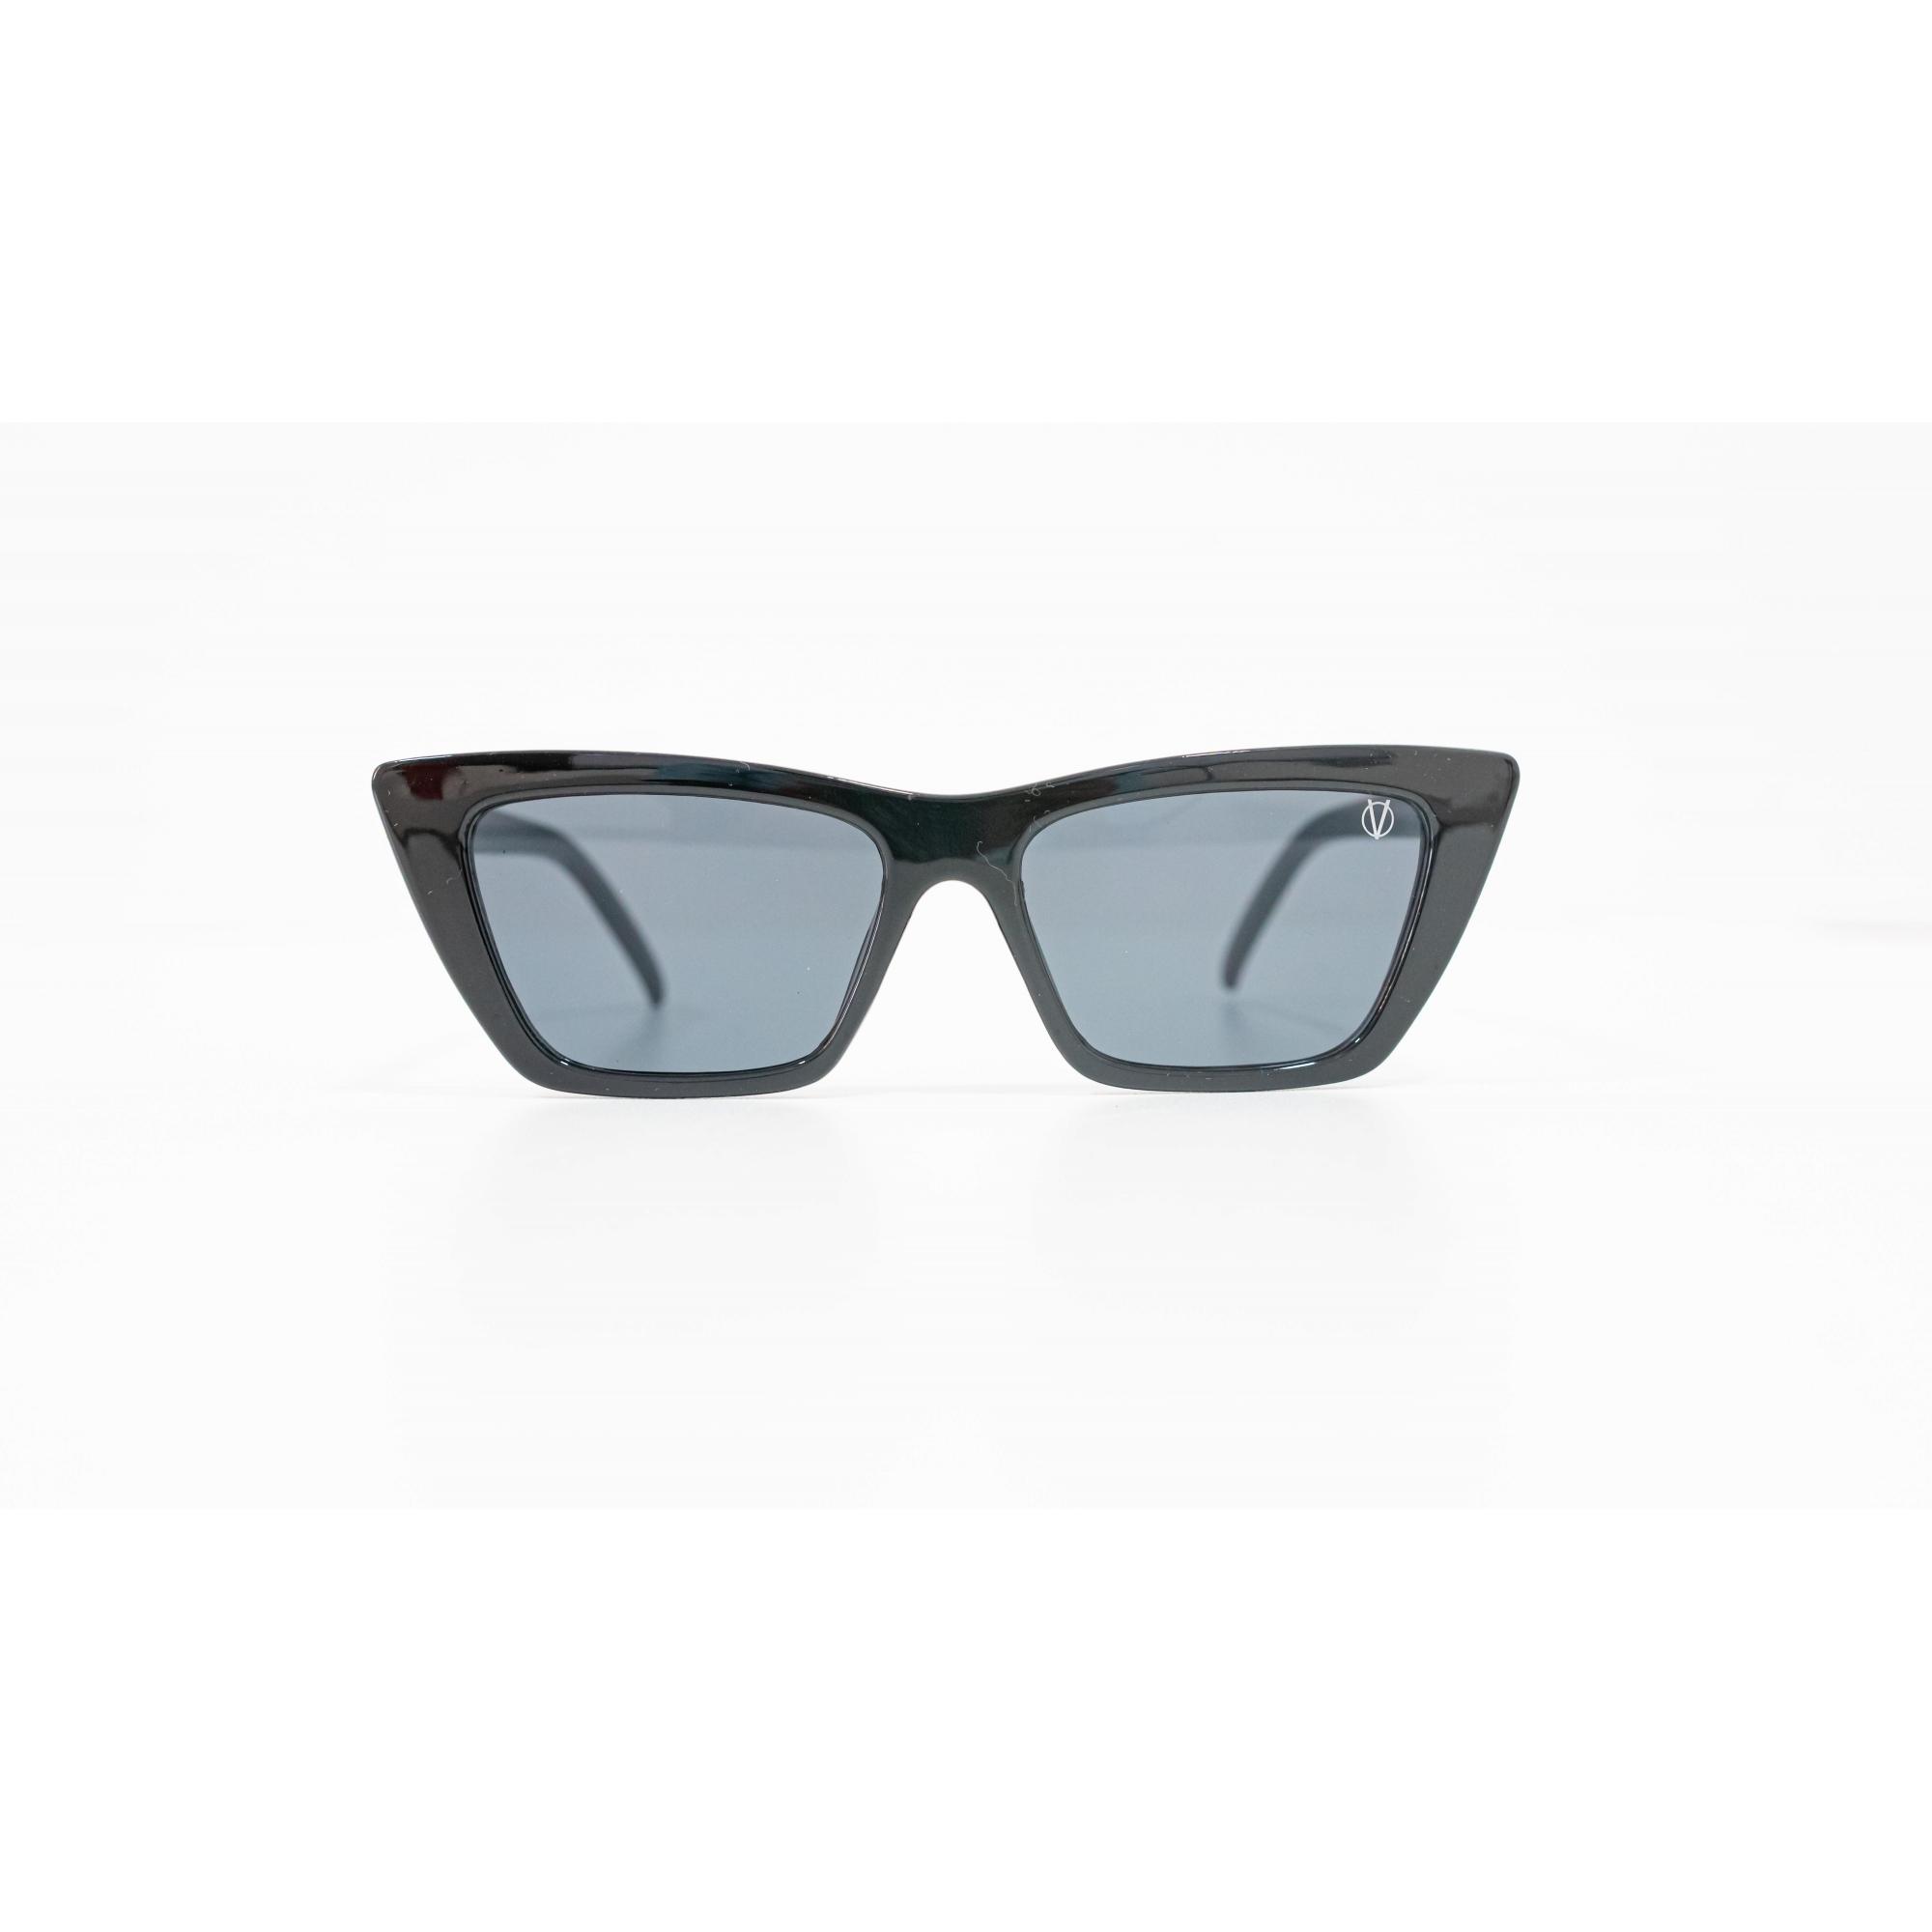 Óculos Vistta Aping Cat Eye 5102 52 Preto